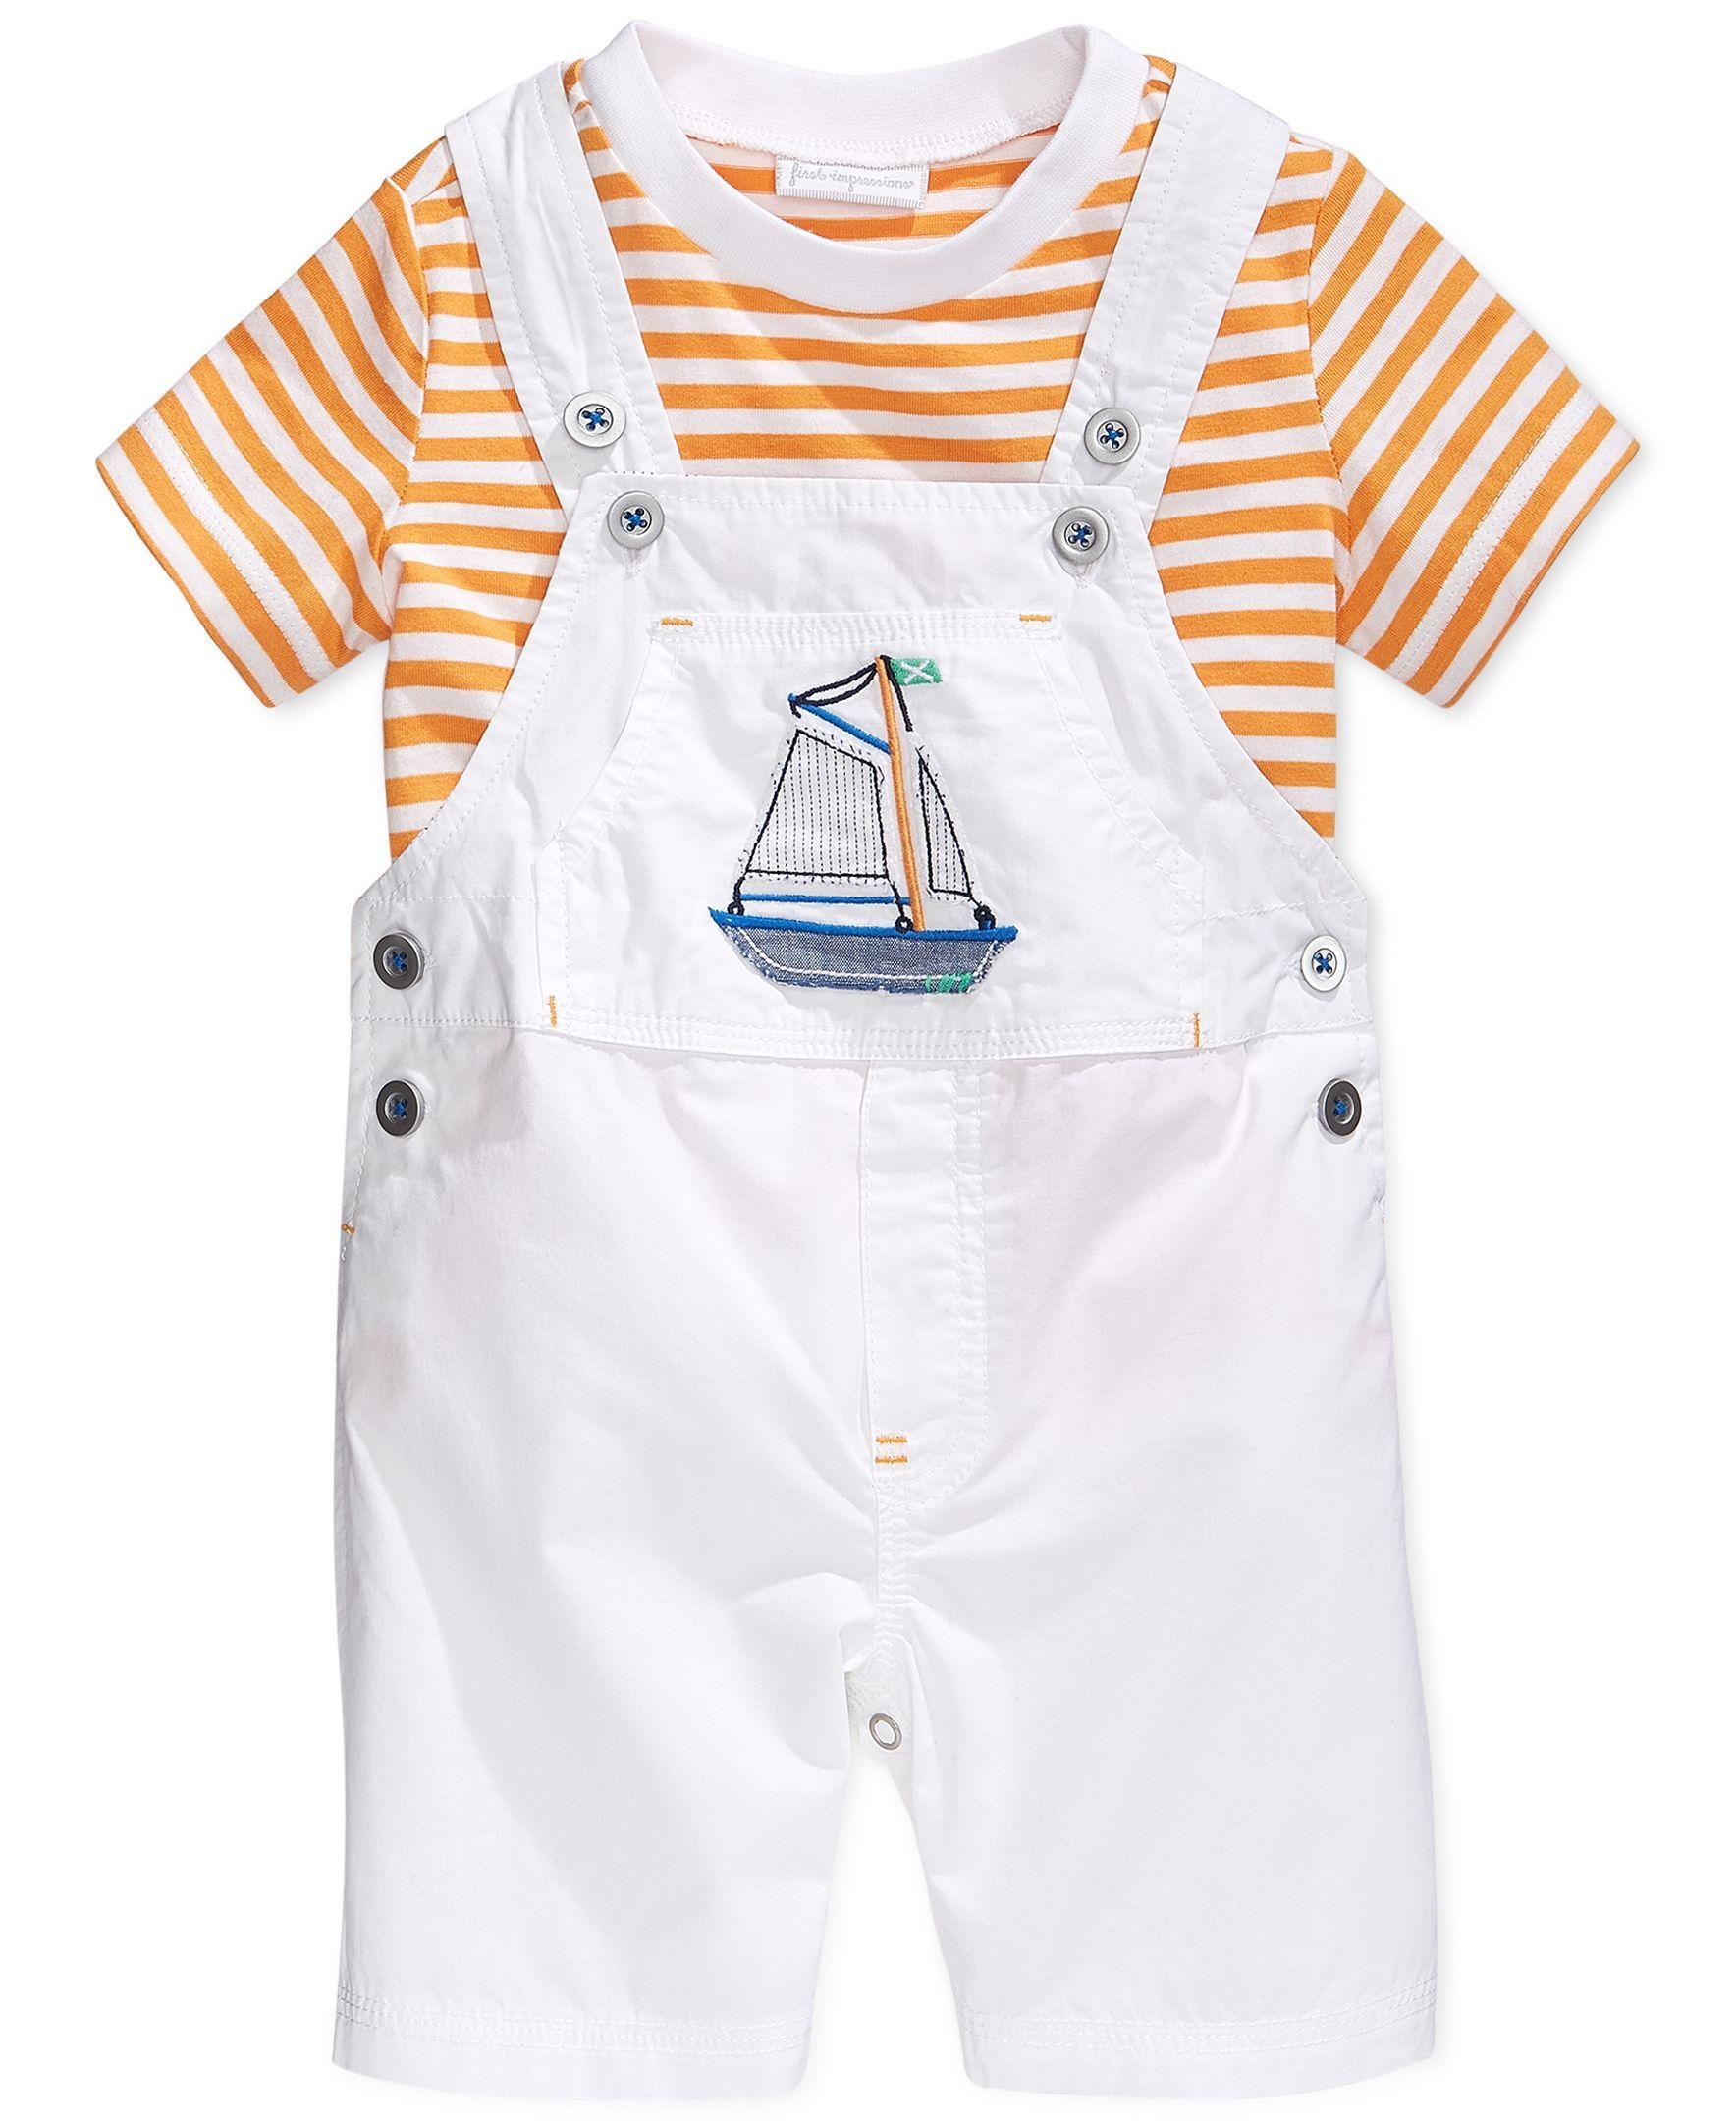 First Impressions Baby Boys' 2-Piece Tee & Shortalls Set